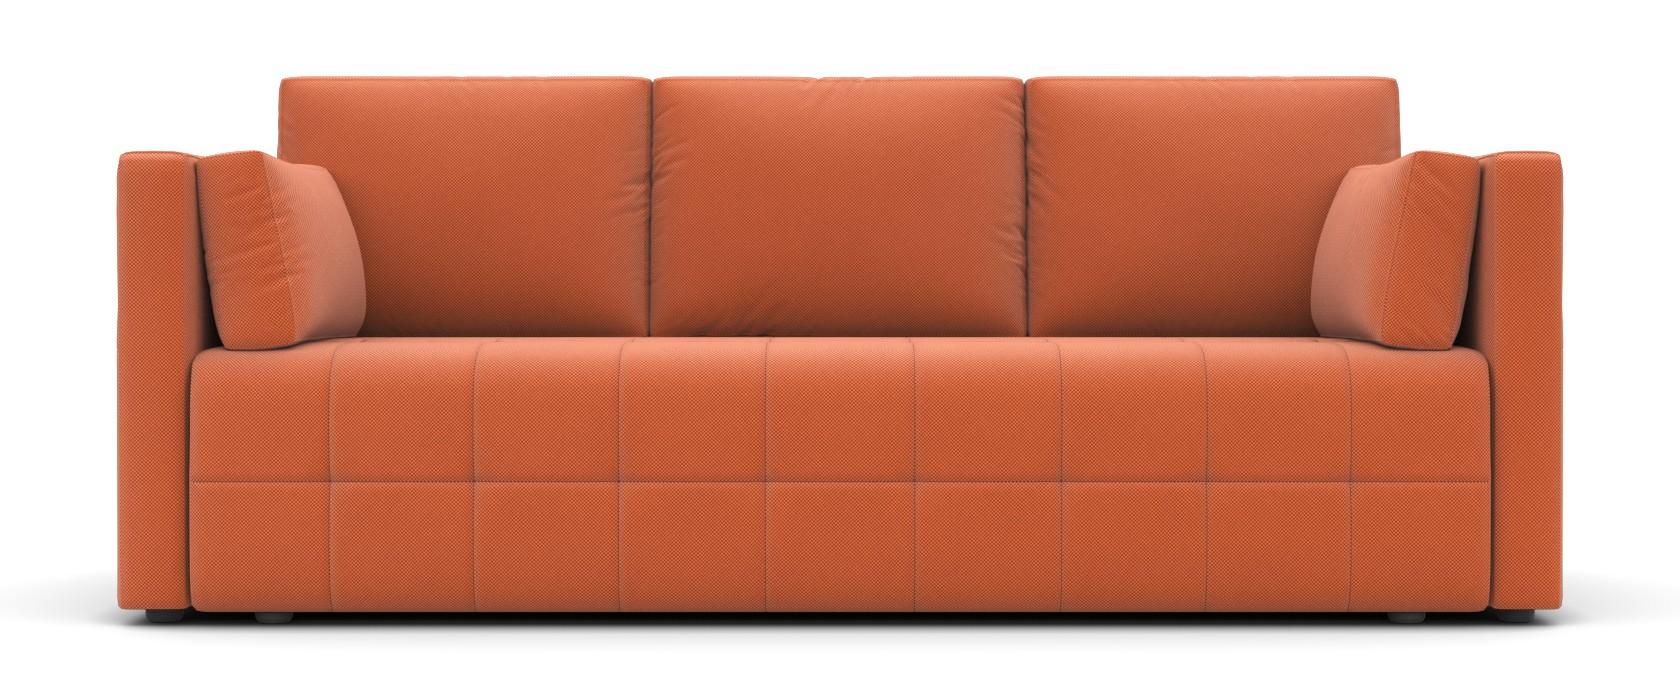 Трехместный диван Sofia - Pufetto